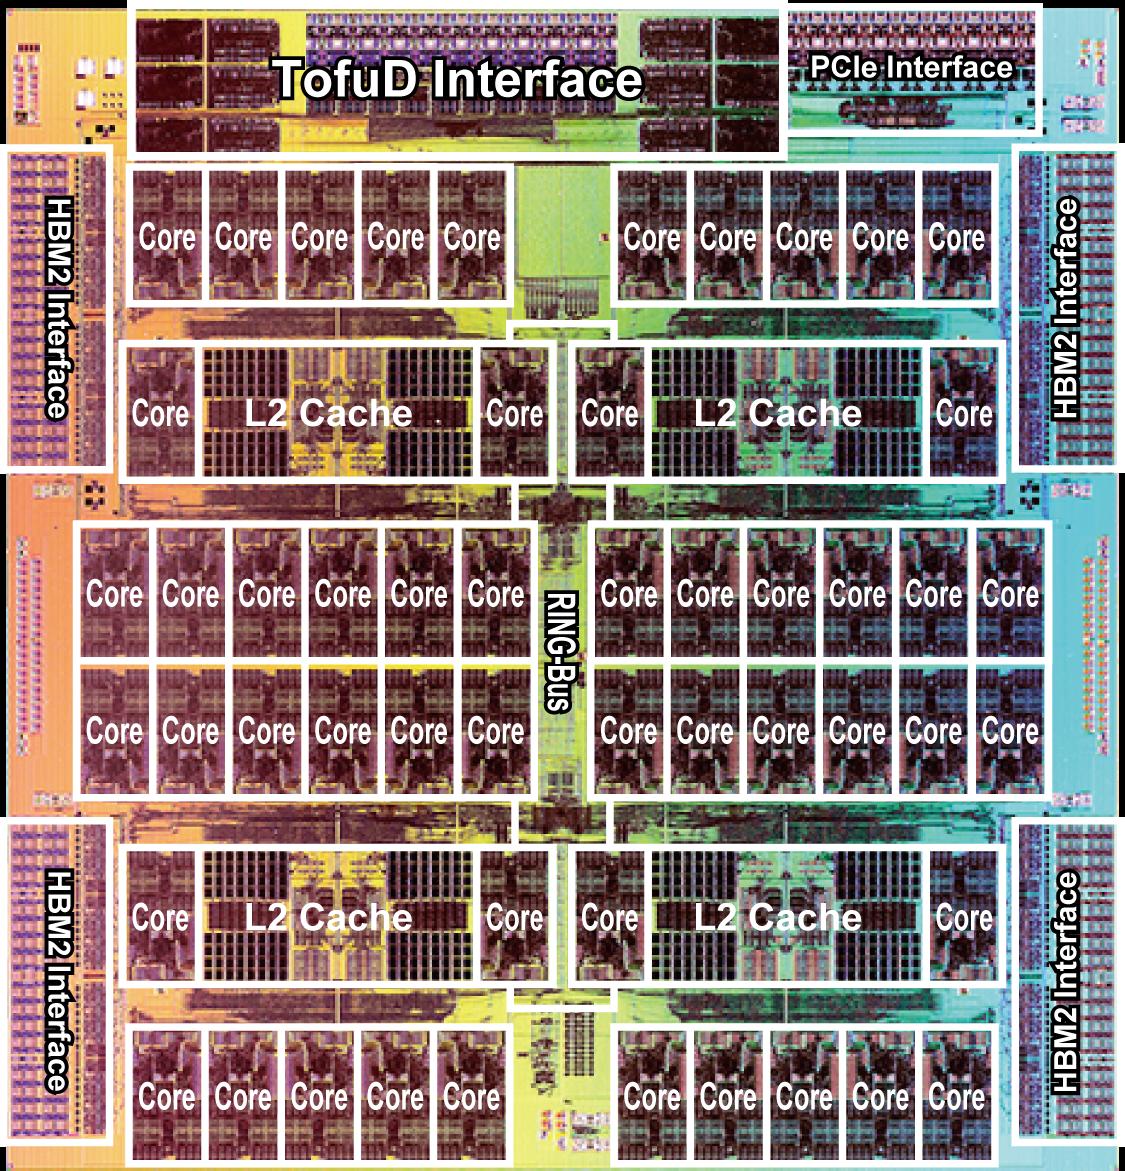 CPU-Die (Image courtesy of Fujitsu) (*) Click to enlarge